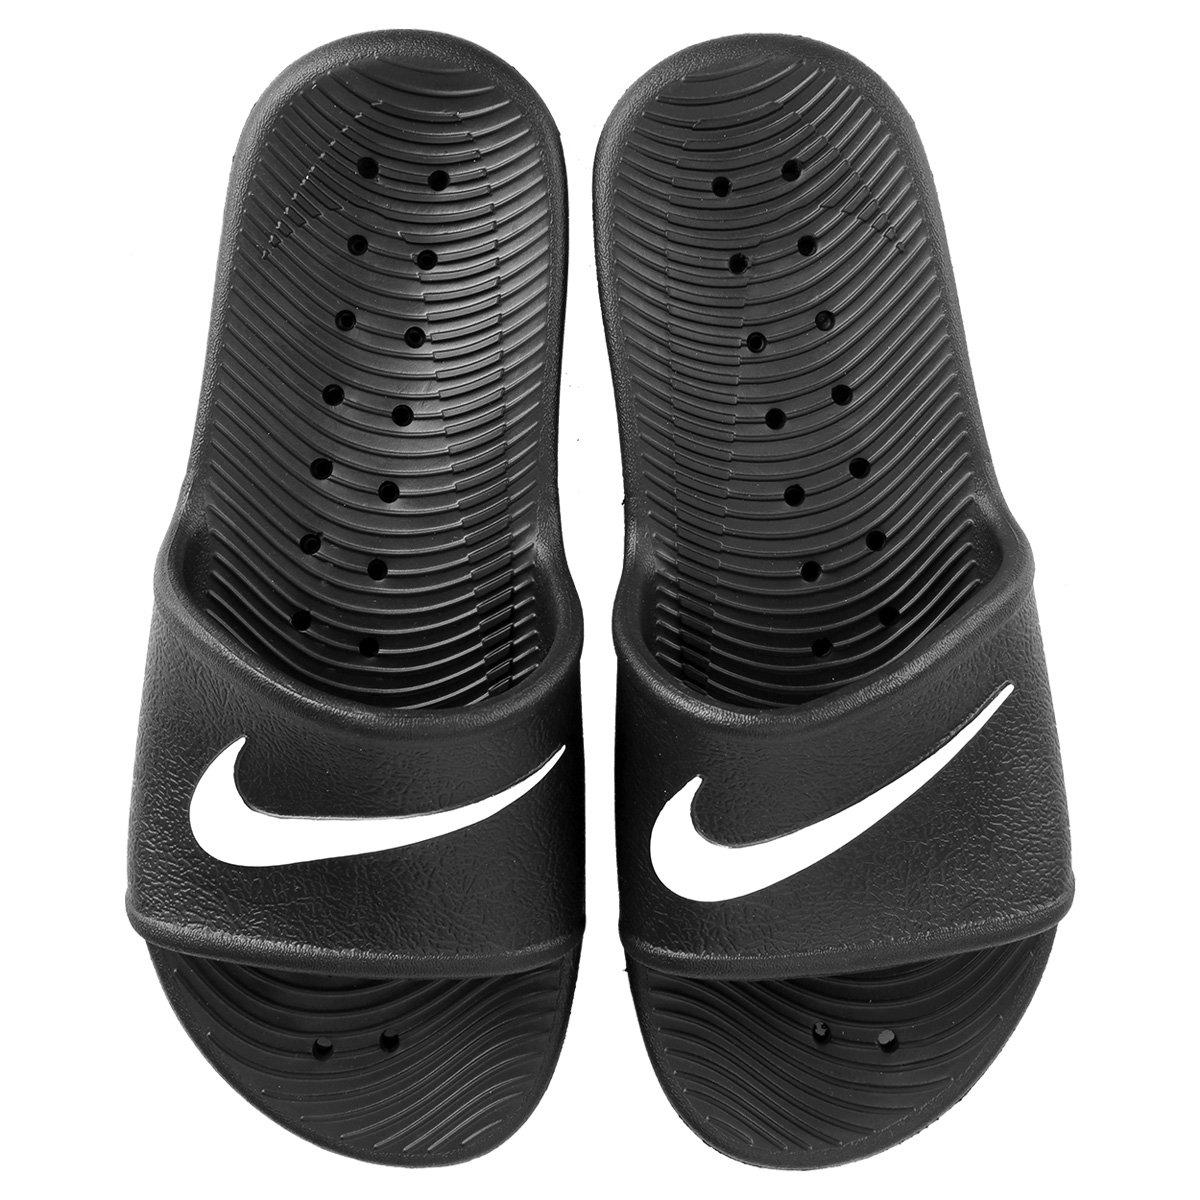 12eca922d1 Sandália Nike Kawa Shower 832655-001 - Preto Branco - Botas Online ...